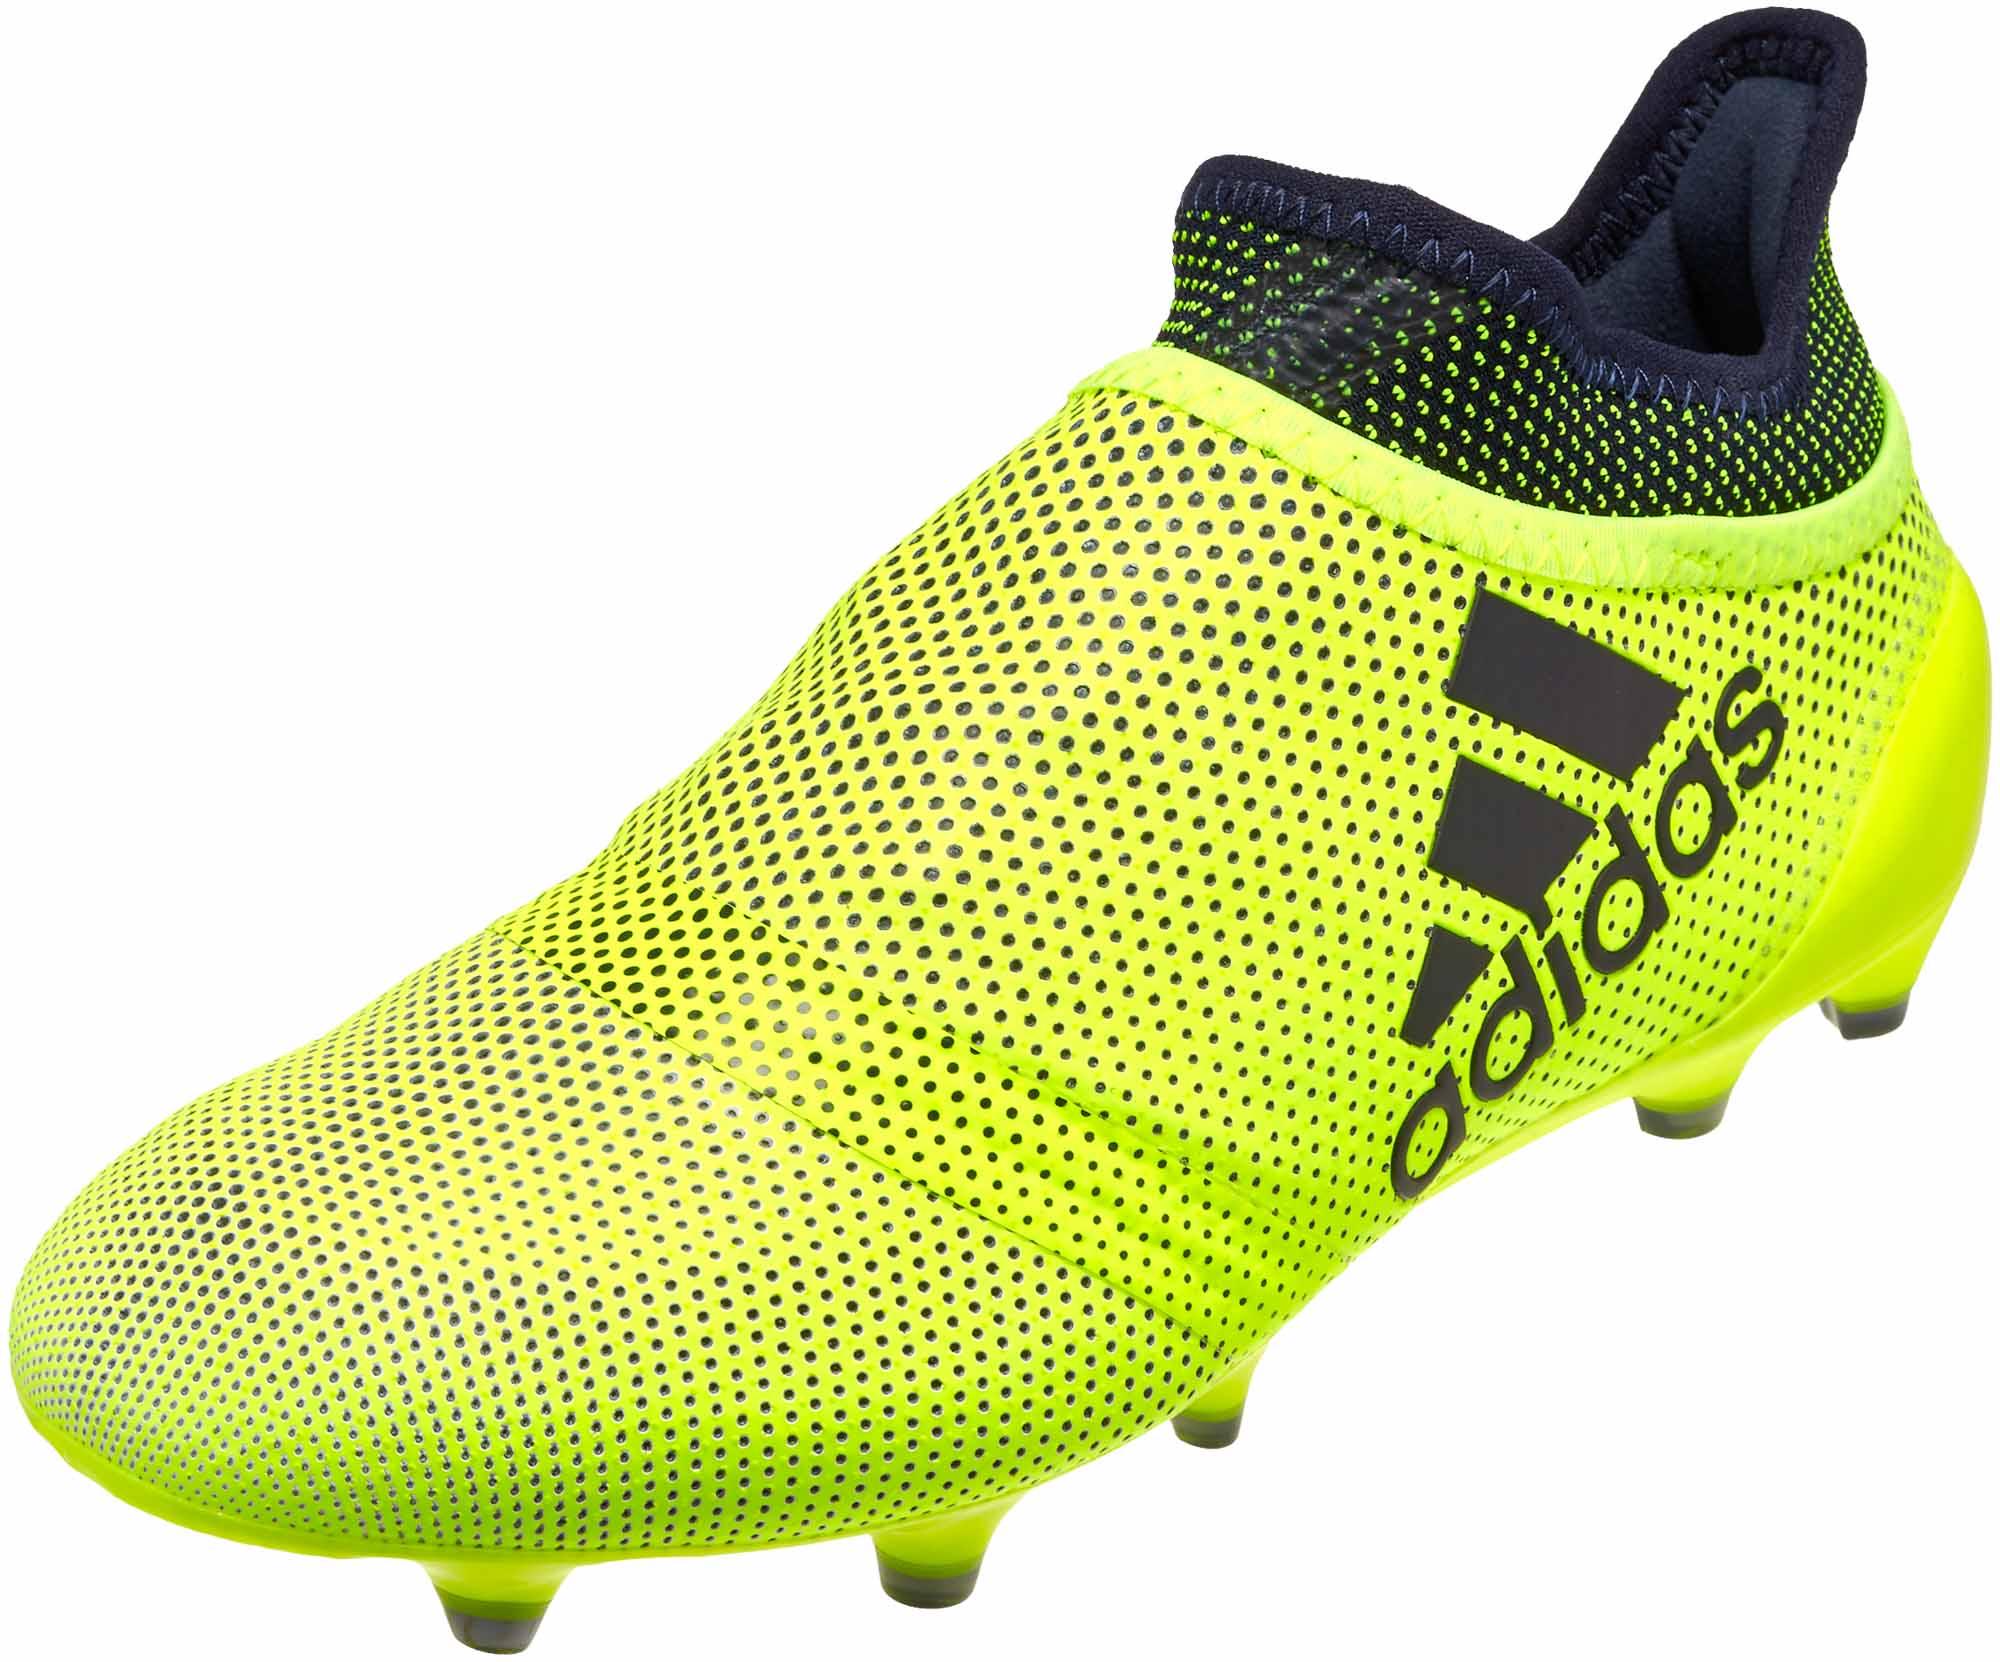 huge selection of 10c2d 6ce7d adidas Kids X 17+ Purechaos FG Soccer Cleats - Solar Yellow ...